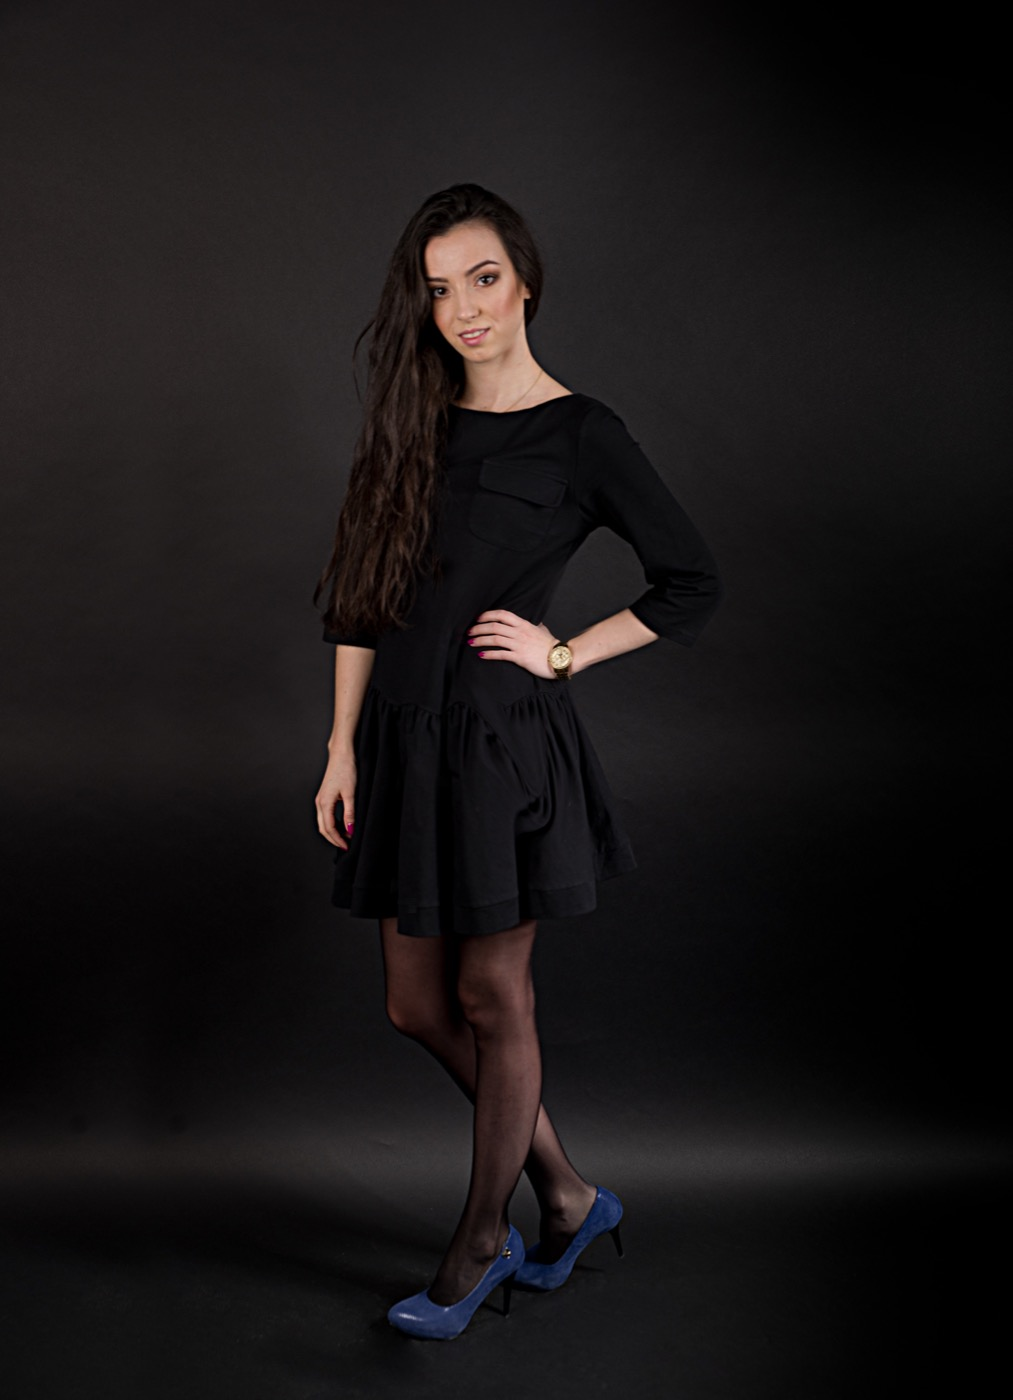 julita_sesja-3